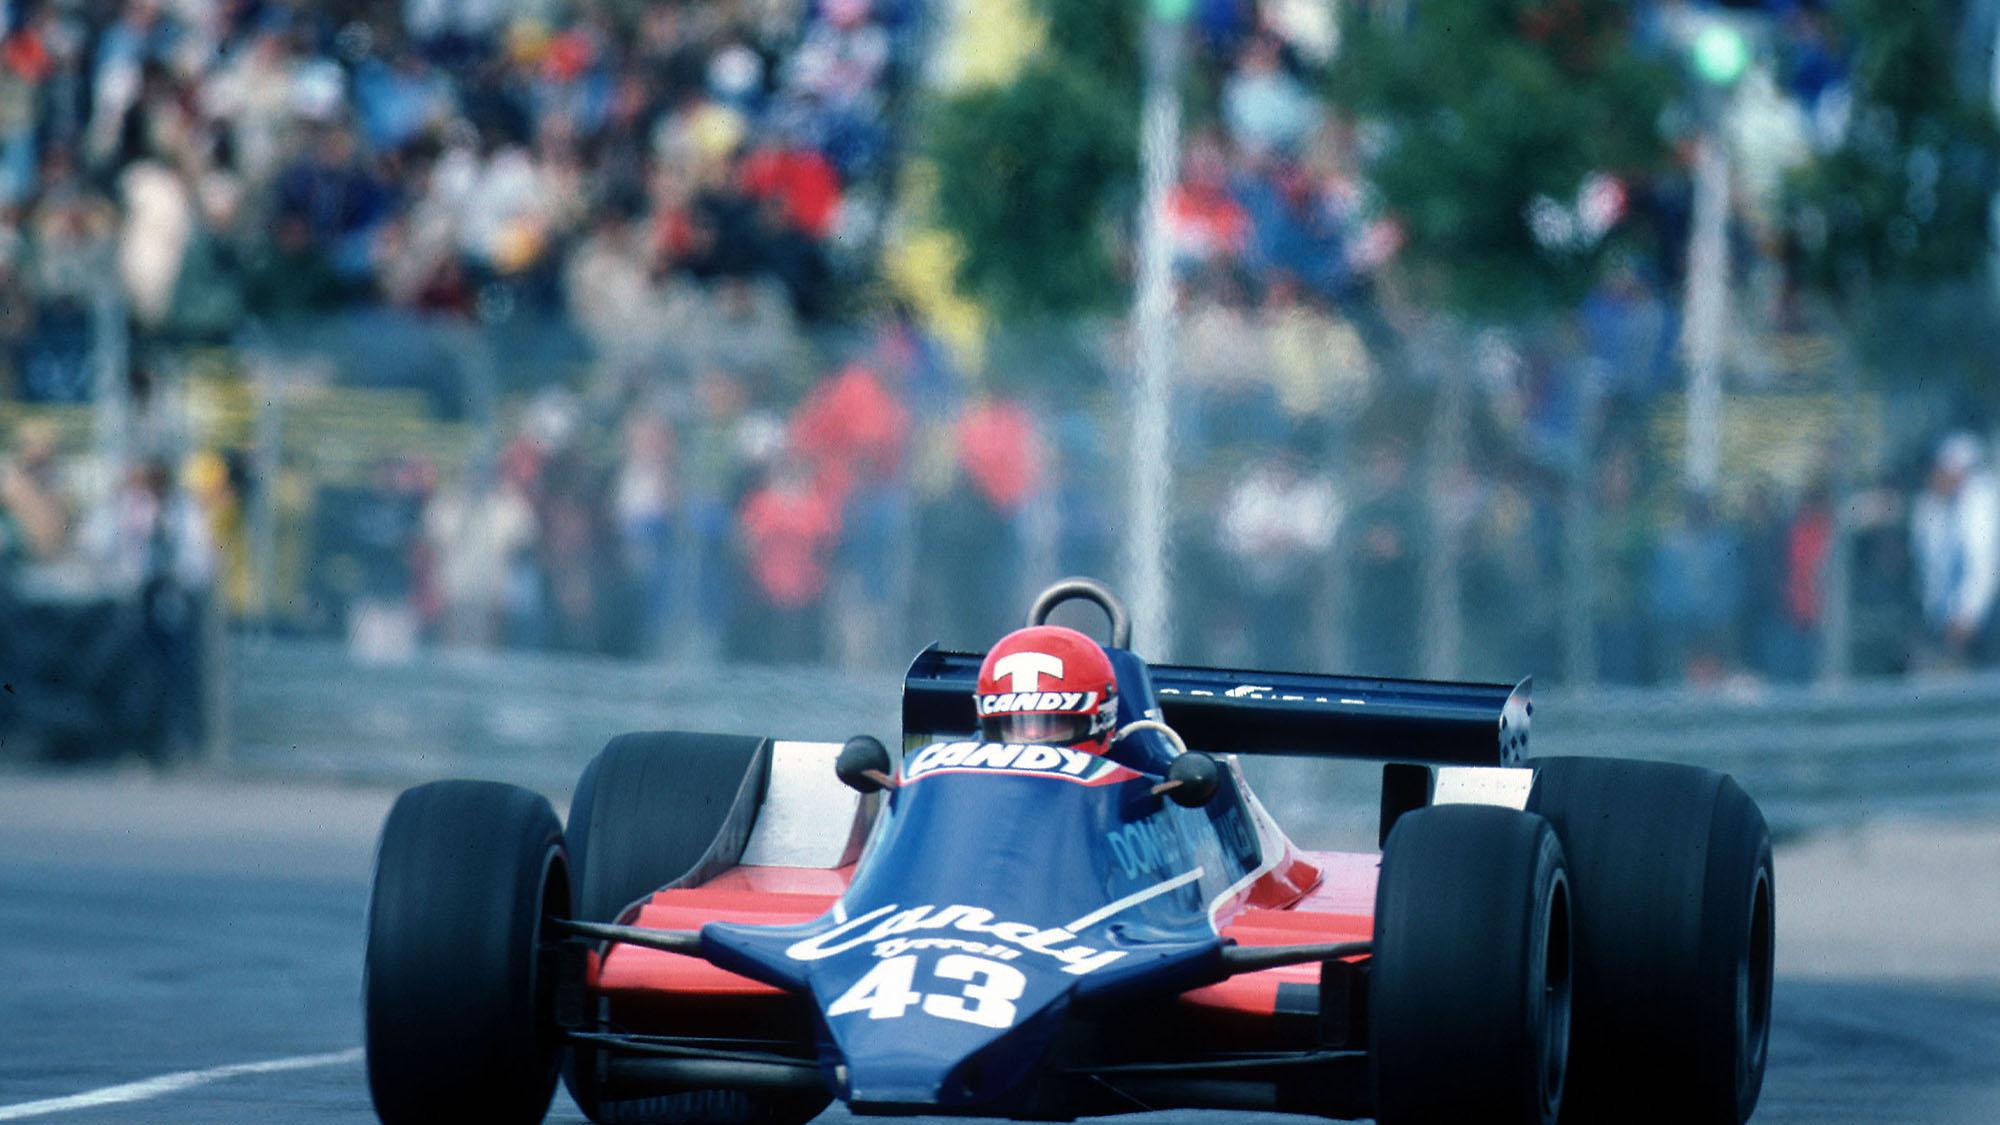 Thackwell Tyrrell